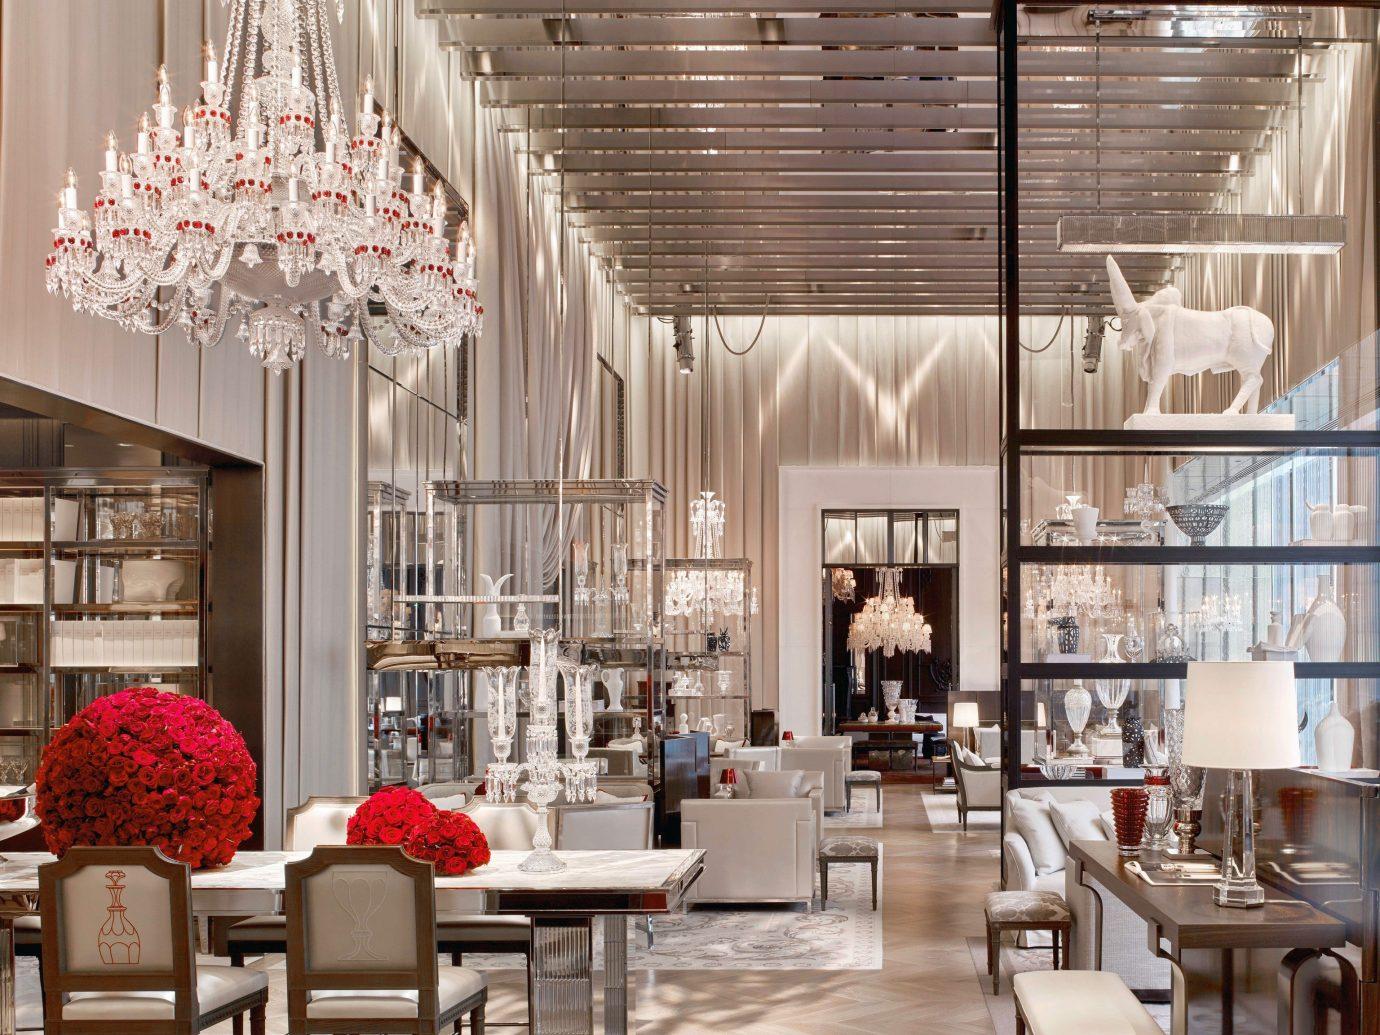 Luxury Travel Trip Ideas table indoor room interior design Lobby restaurant Design lighting window covering living room retail Boutique decorated furniture dining room